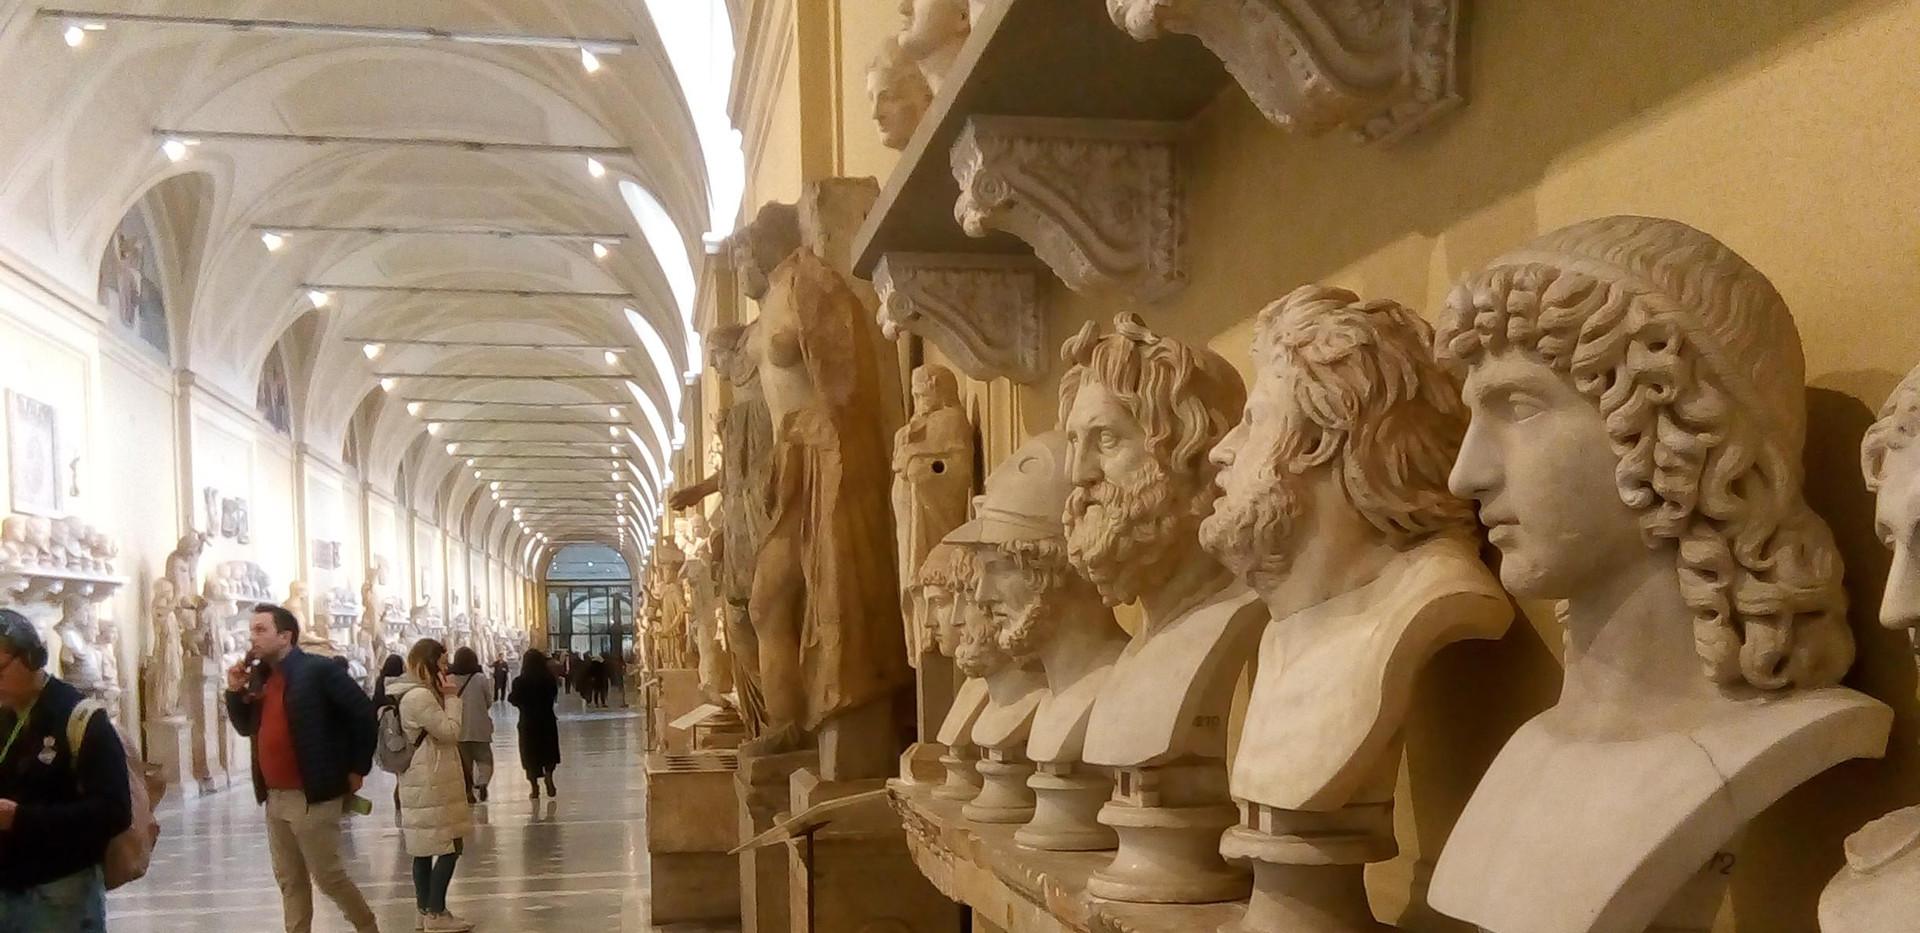 A few Roman Citizens